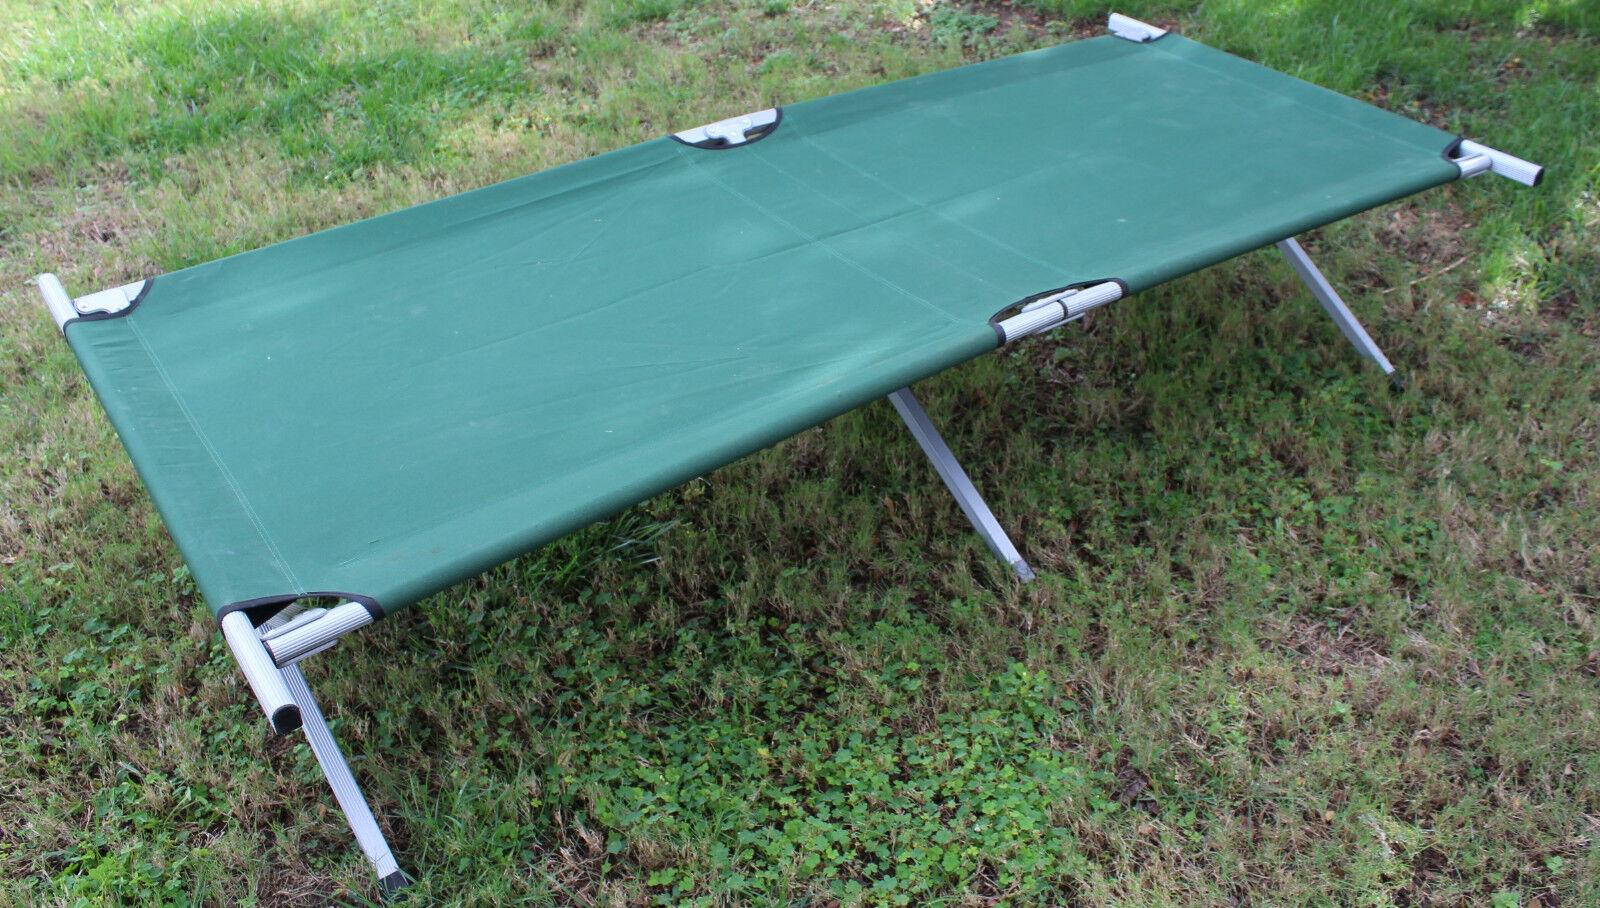 Aluminum Folding Cot Heavy Duty Sleeping Bed Green Lightweight